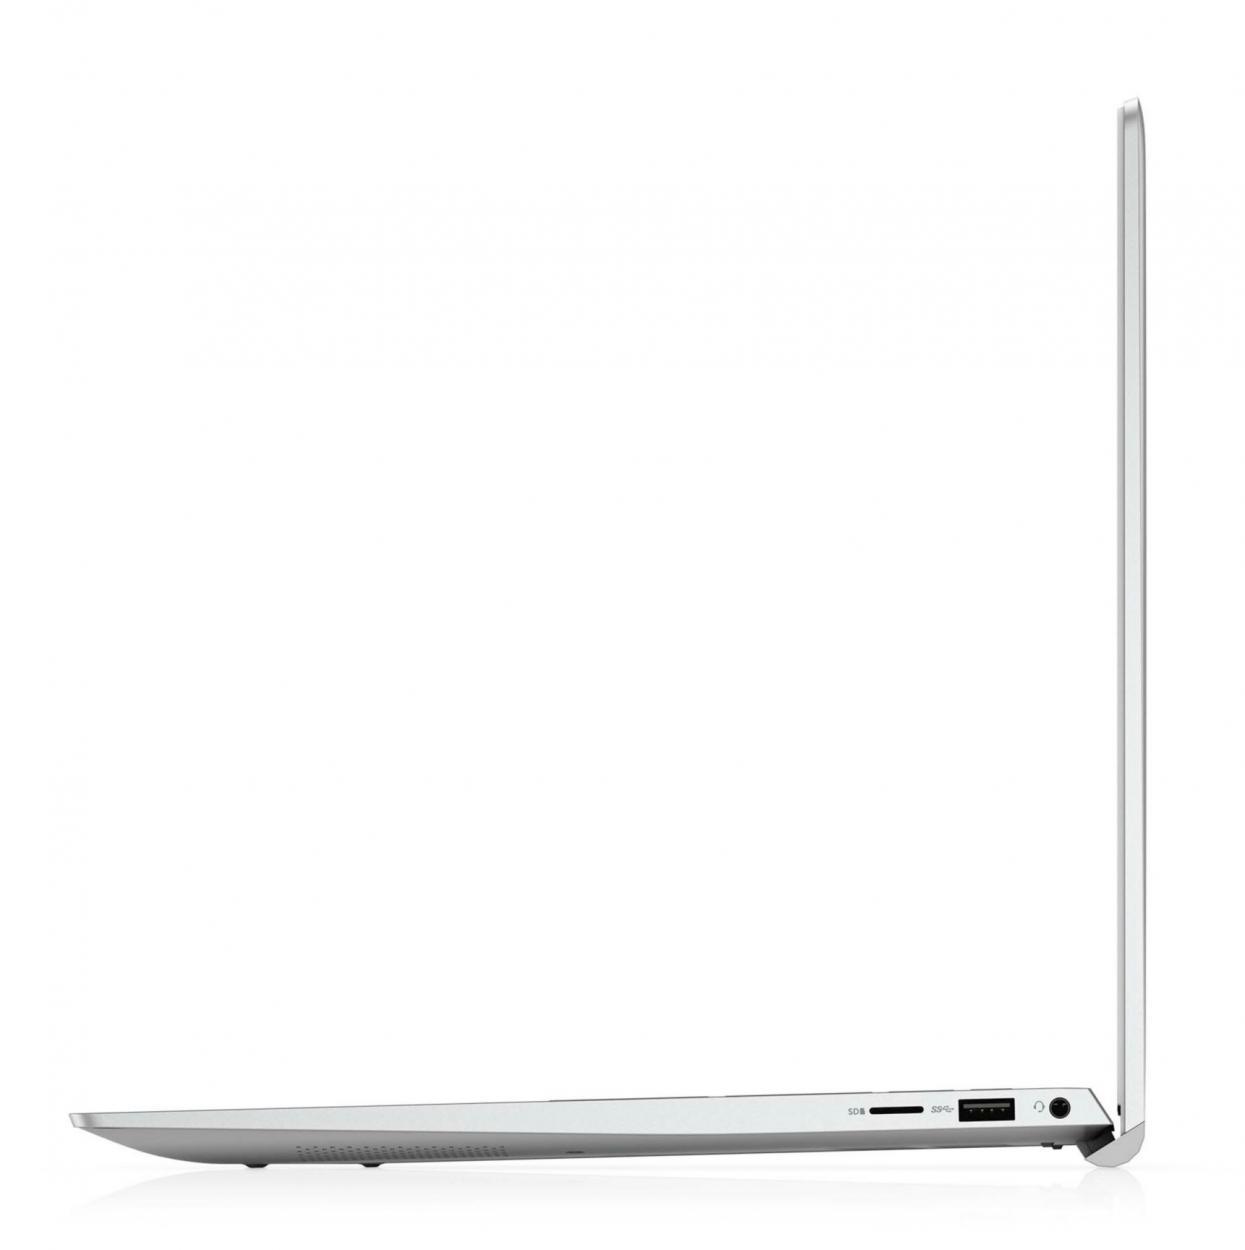 Ordinateur portable Dell Inspiron 15 5502 Argent - Core i5, SSD 256 Go - photo 9